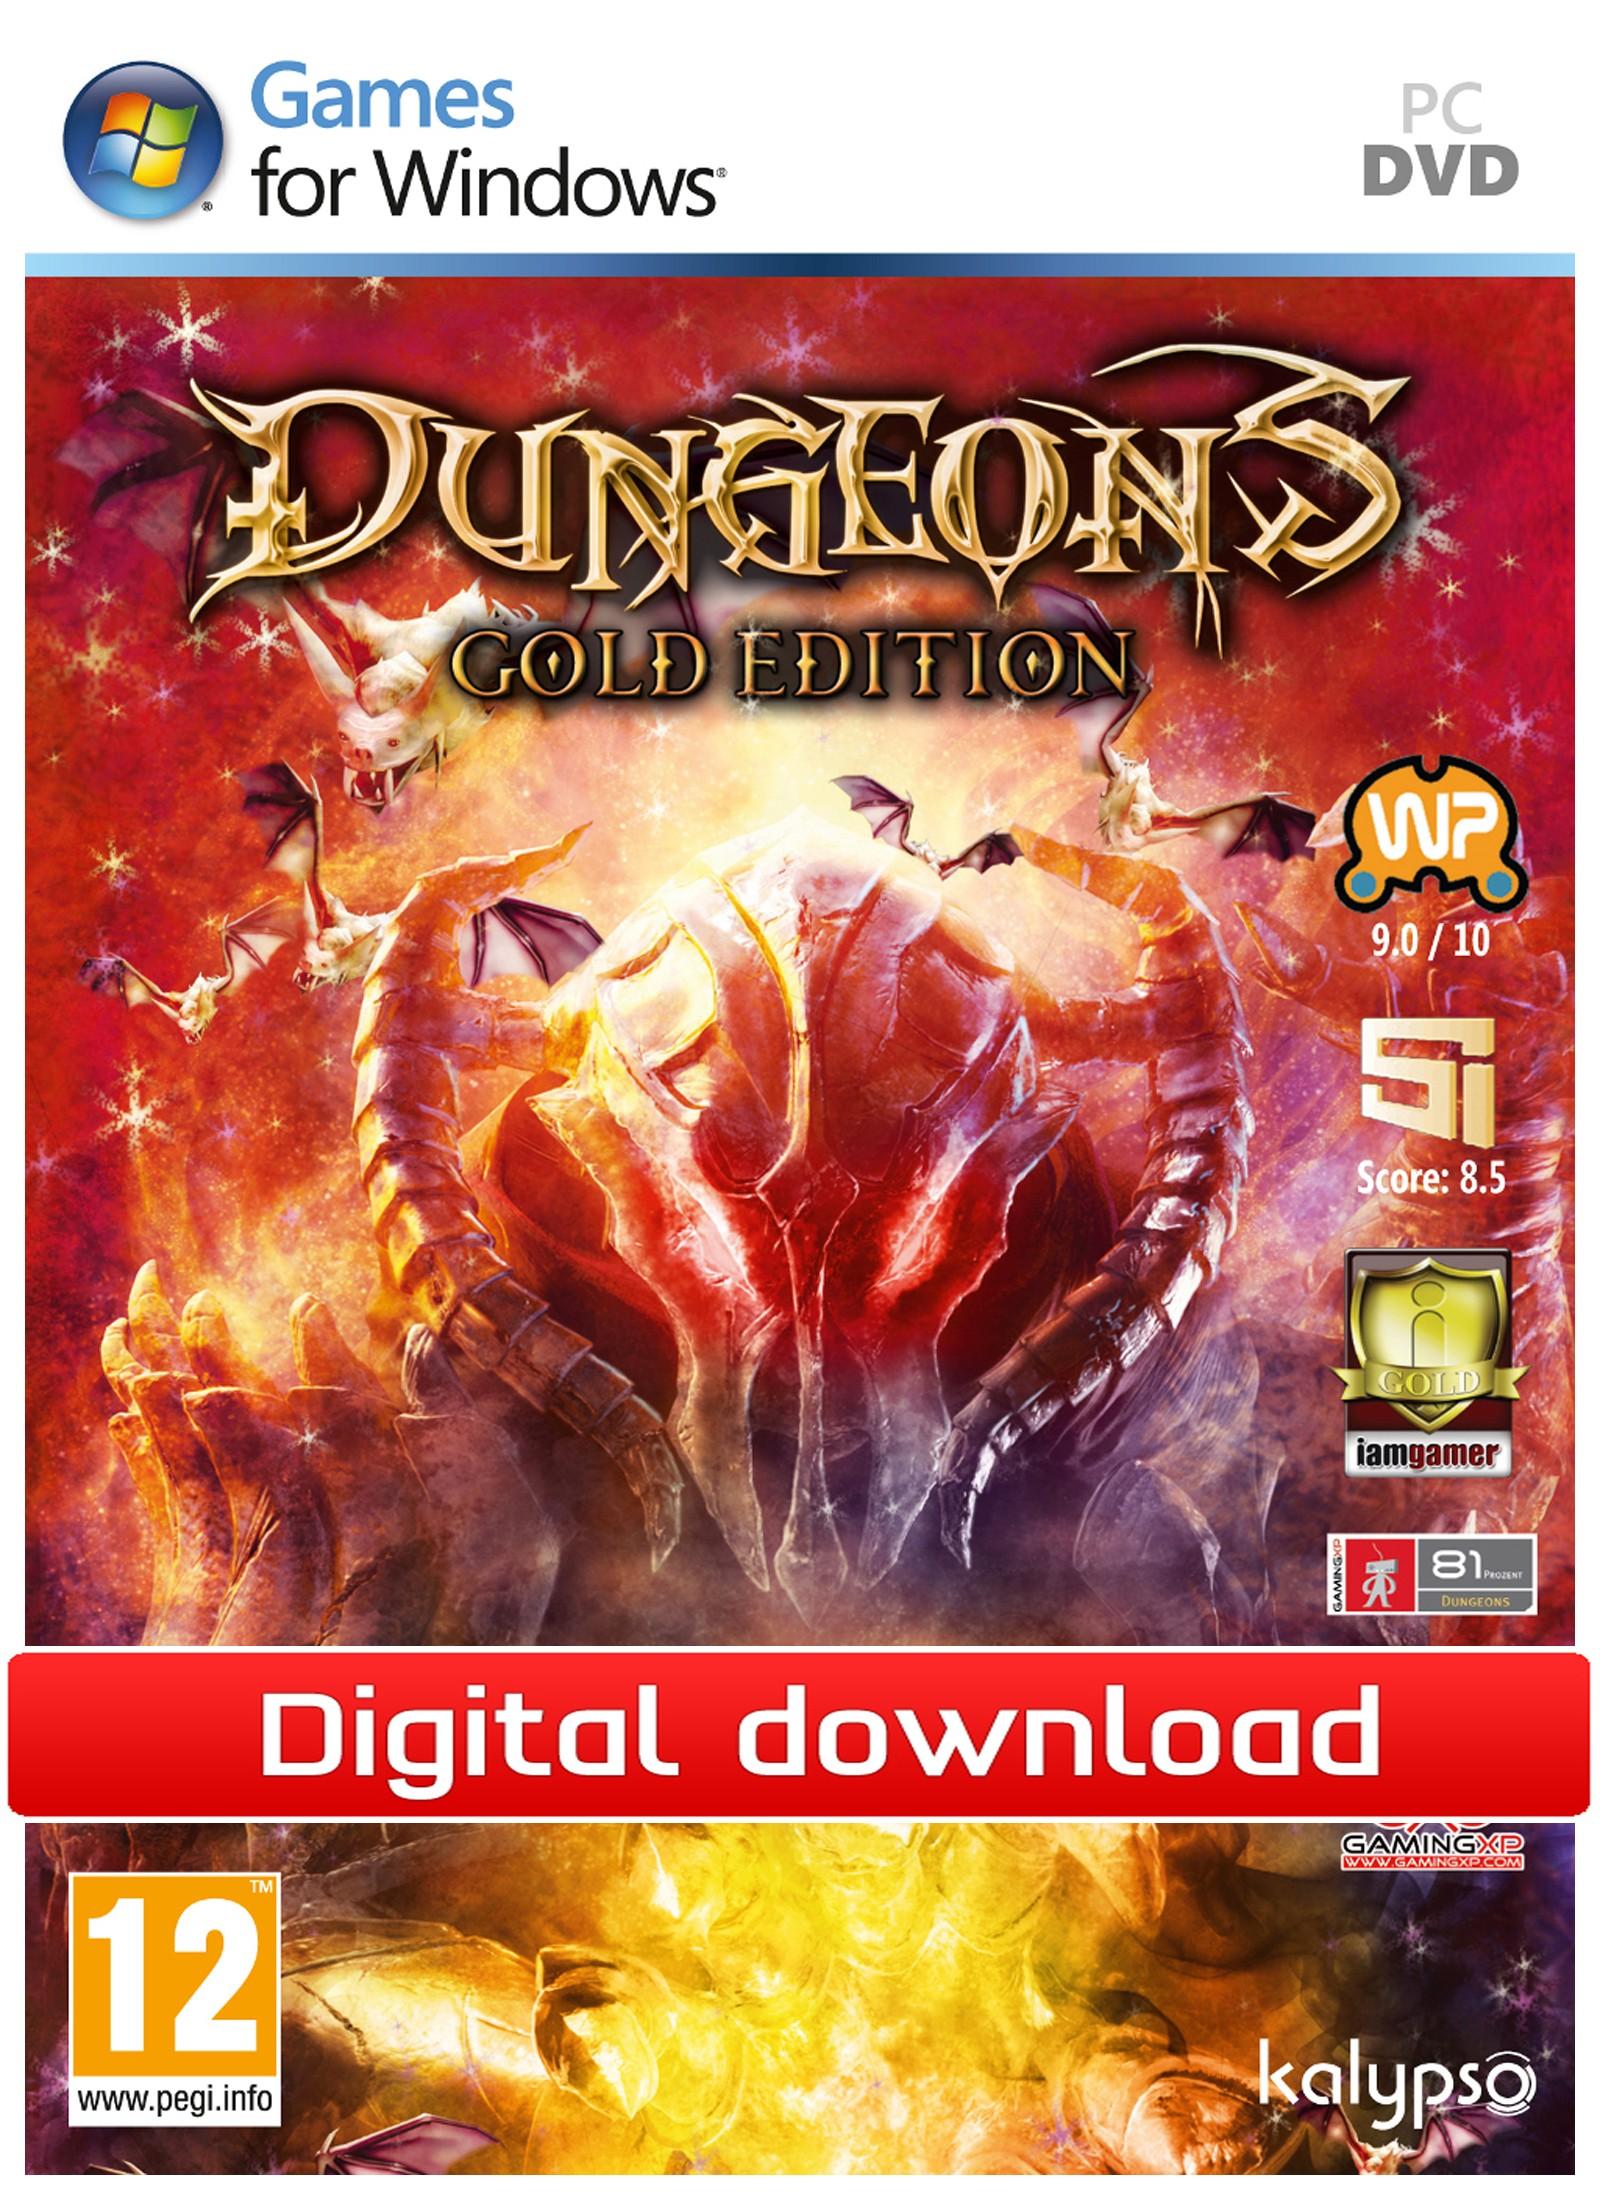 Dungeons: Gold Edition (PC nedlastning) PCDD29769